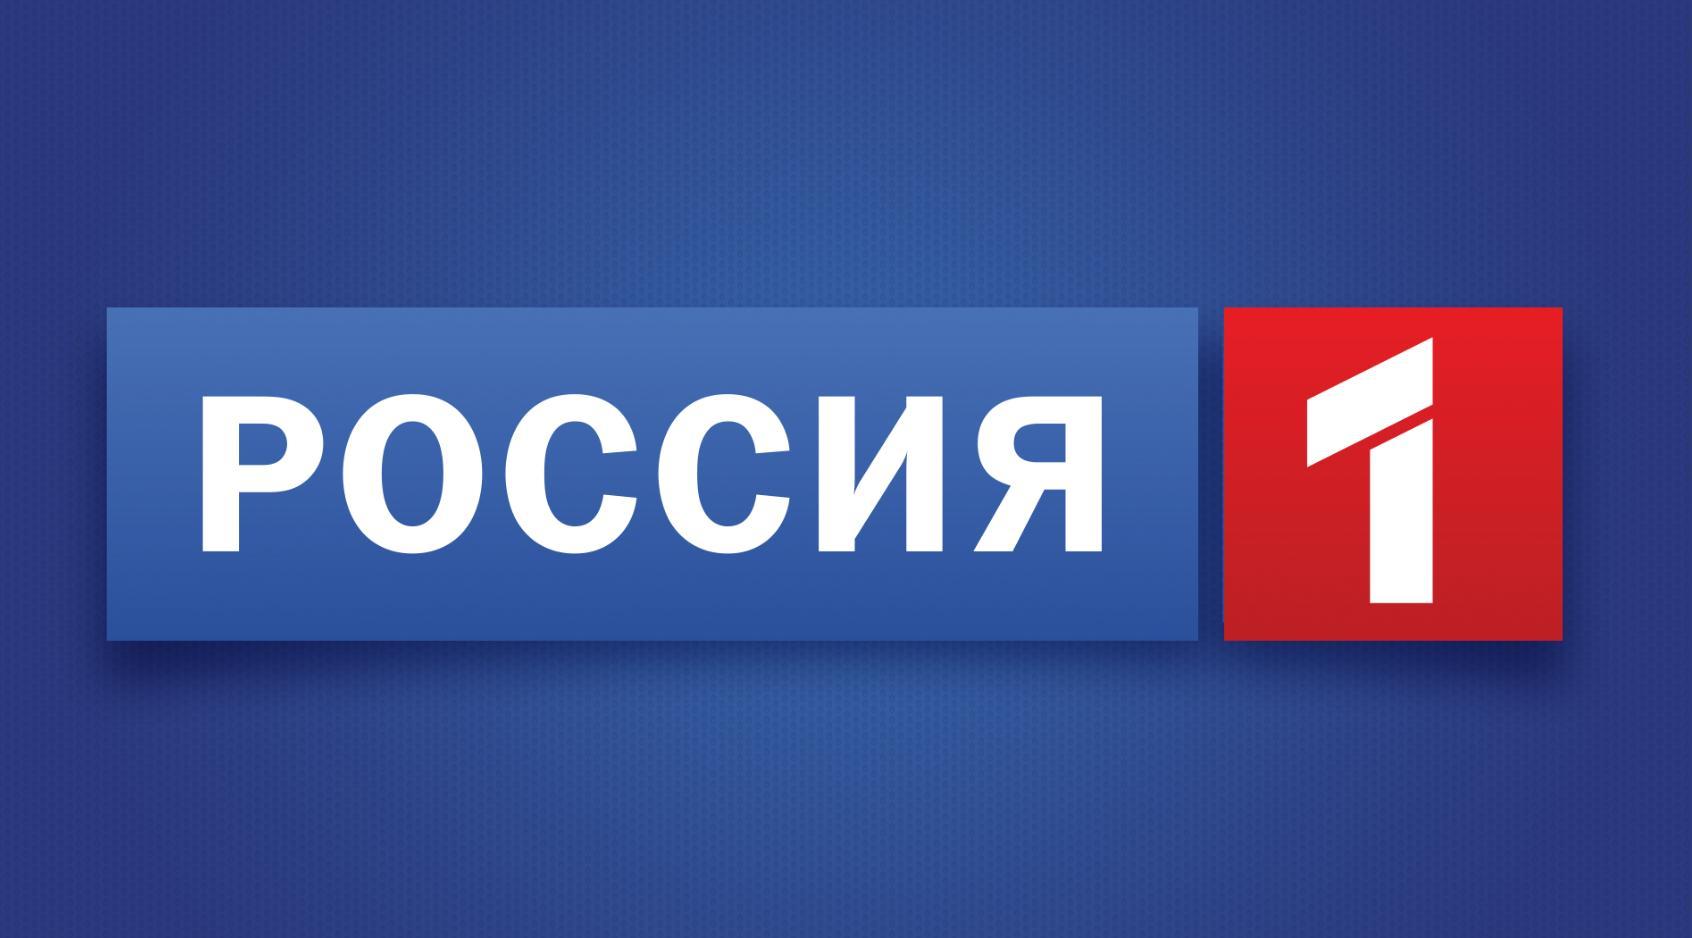 Программа томск россия 1 на сегодня